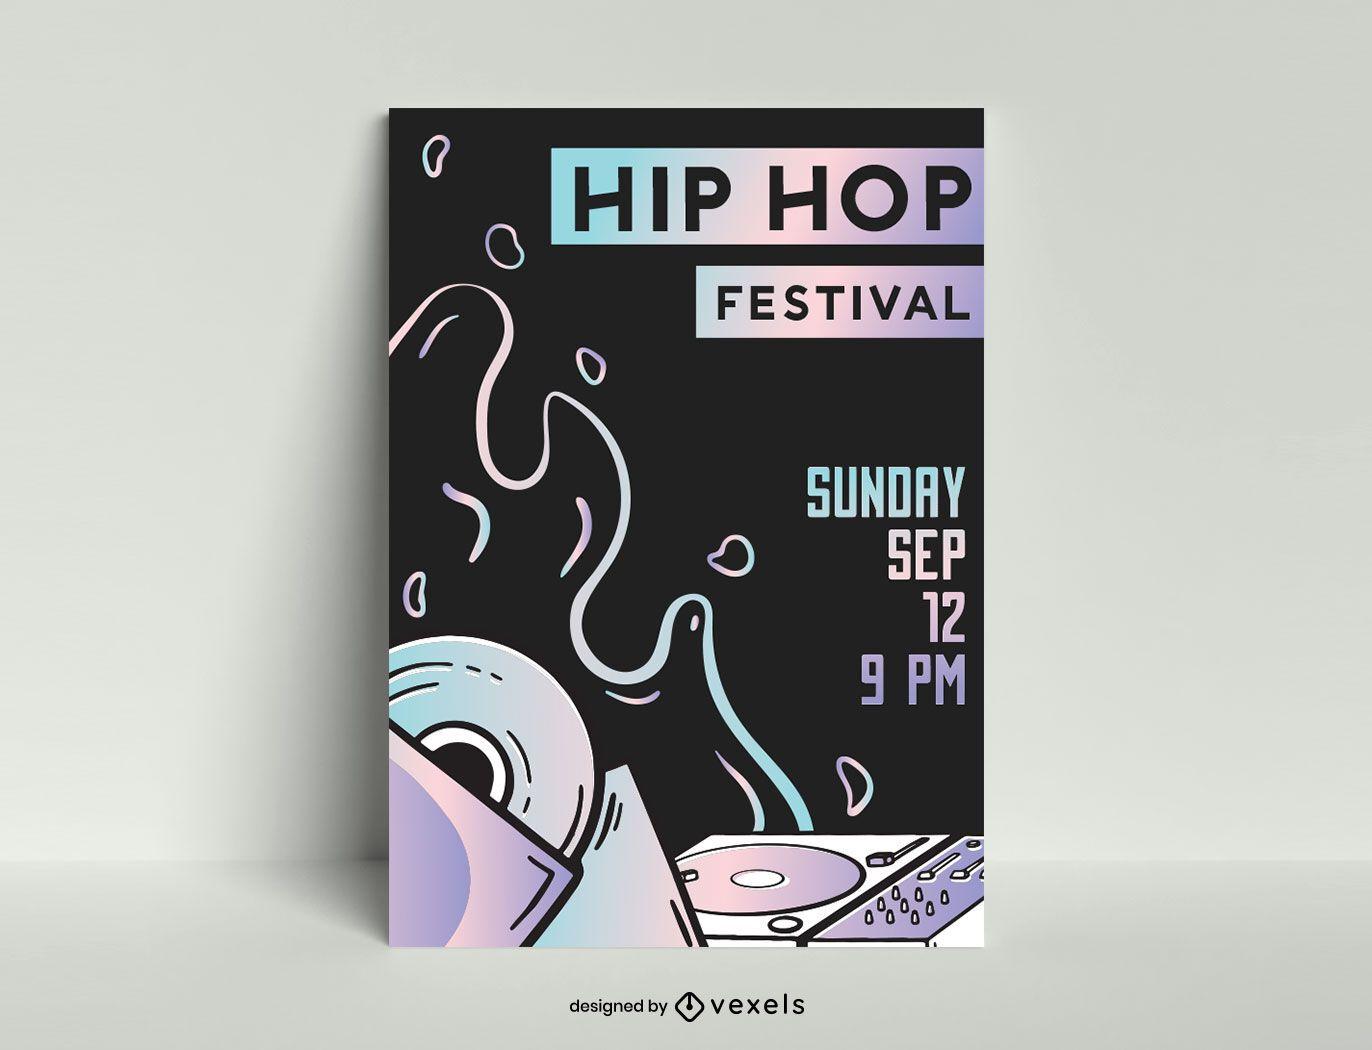 Hip hop festival poster template